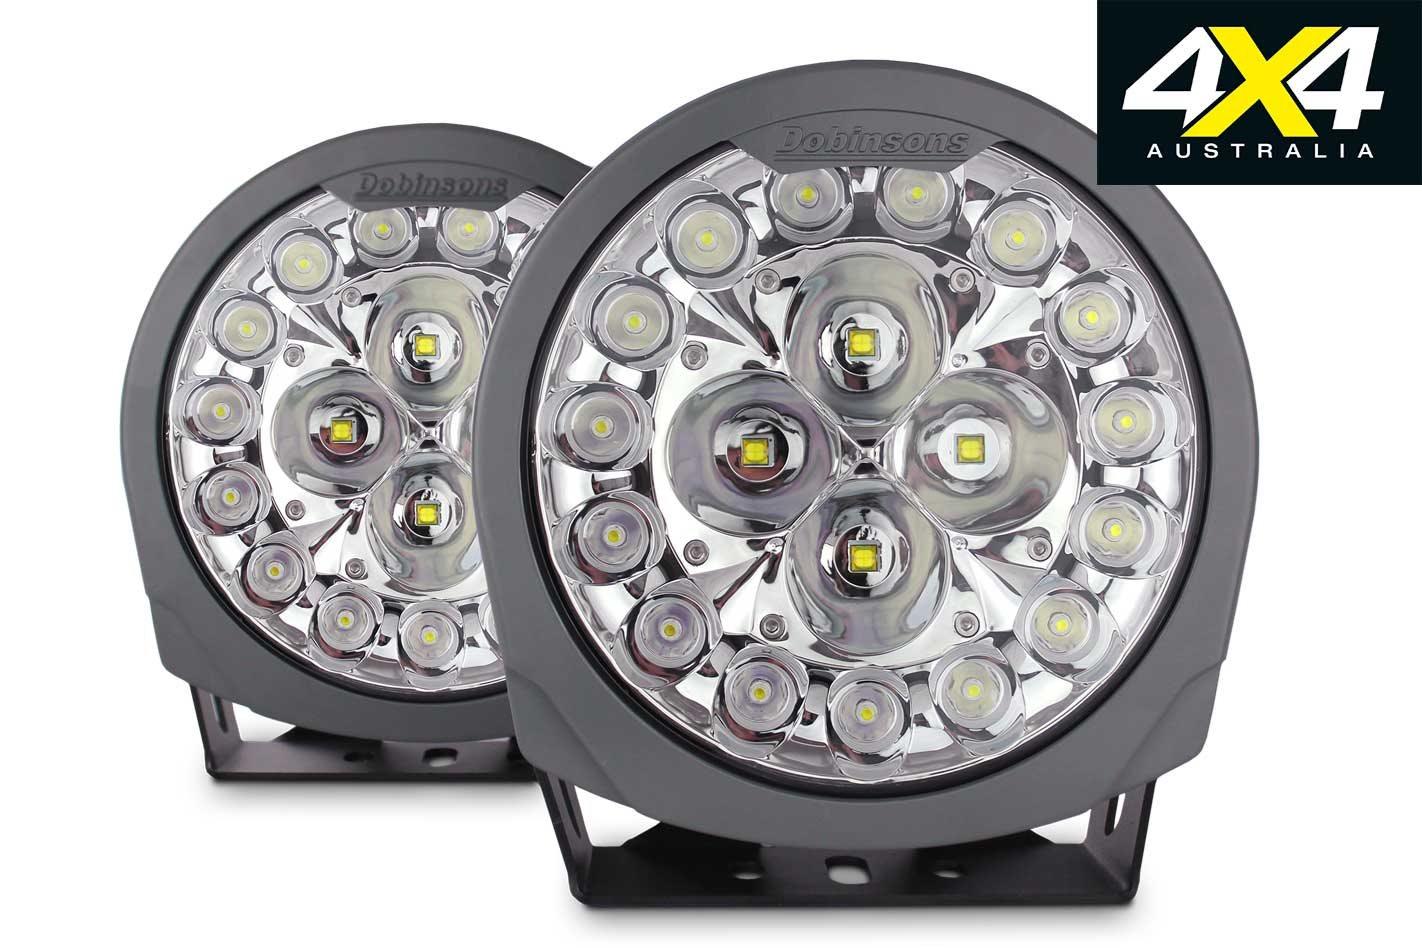 LED light buyers\' guide